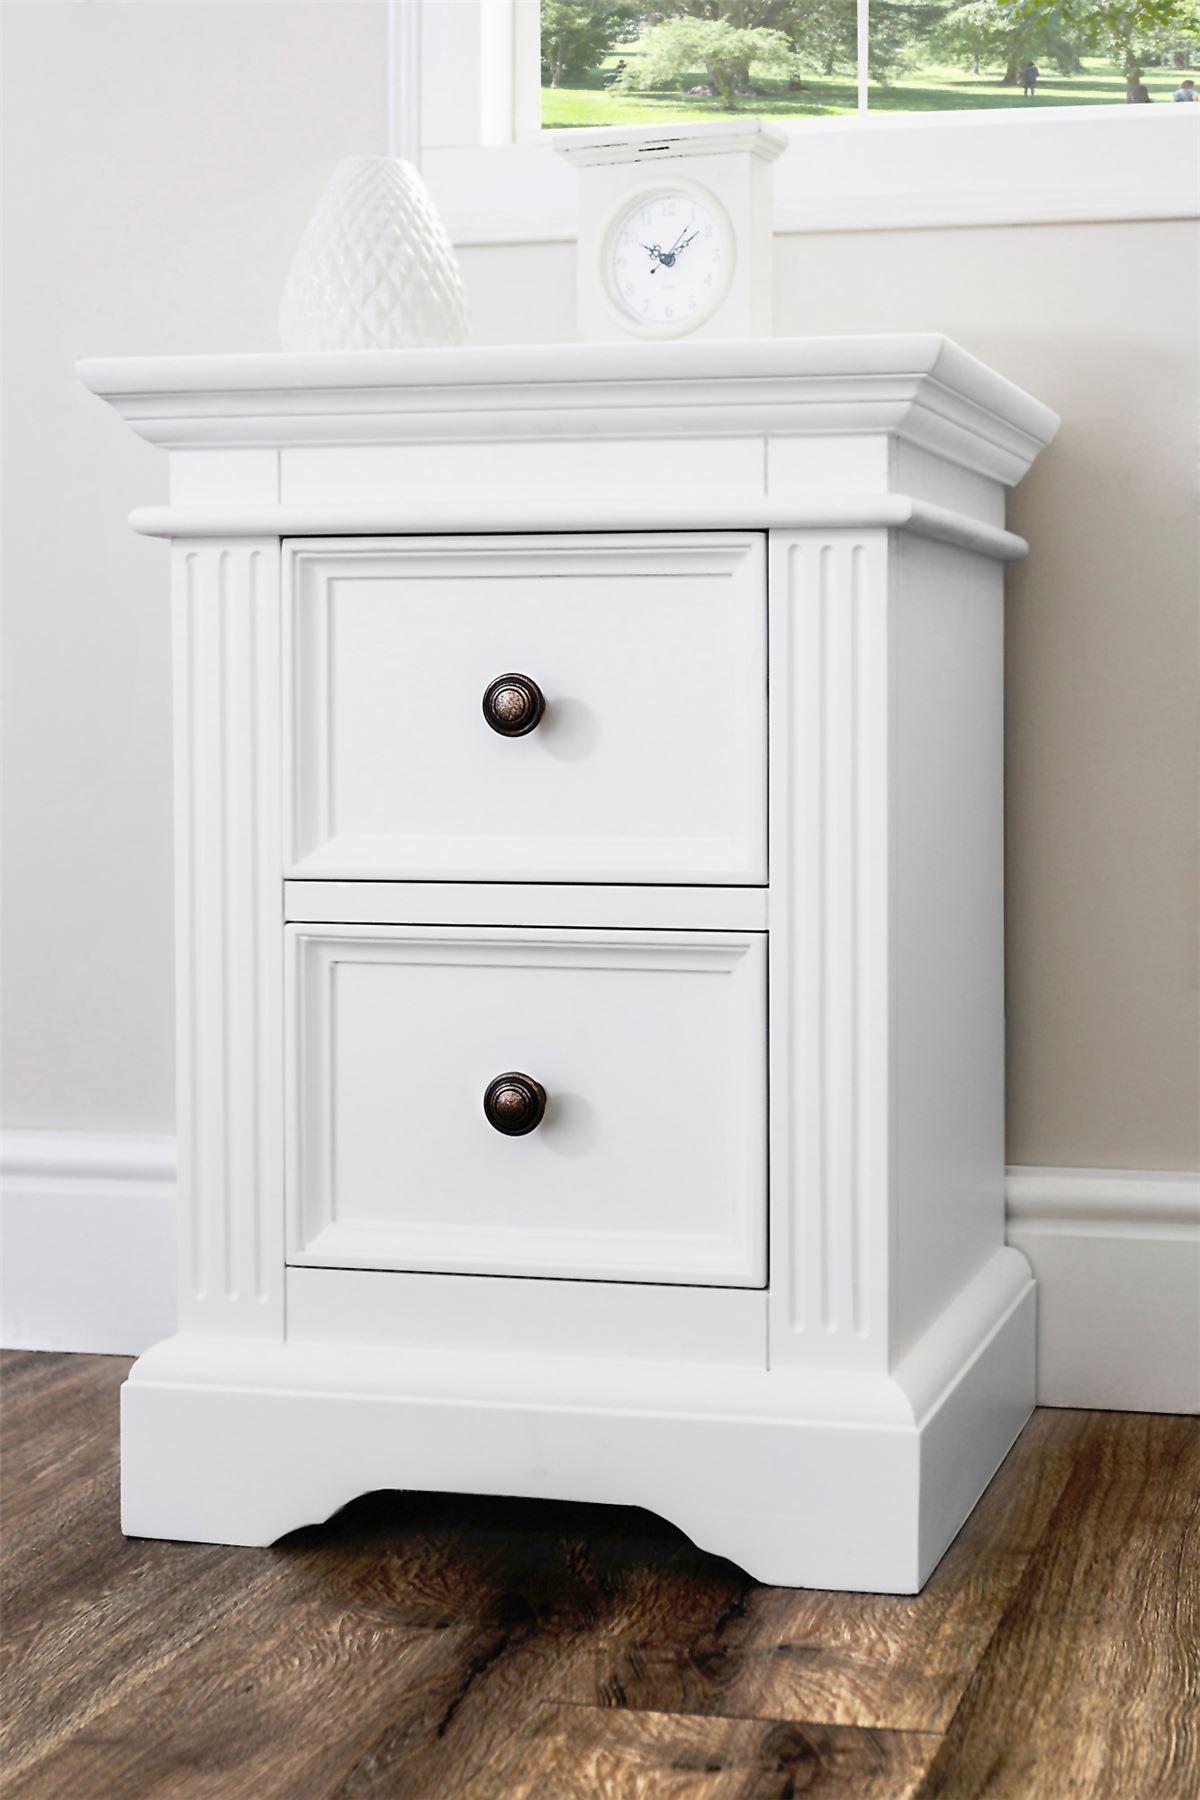 Locker Bedside Table: Gainsborough White Bedside Table, Solid Bedside Cabinet